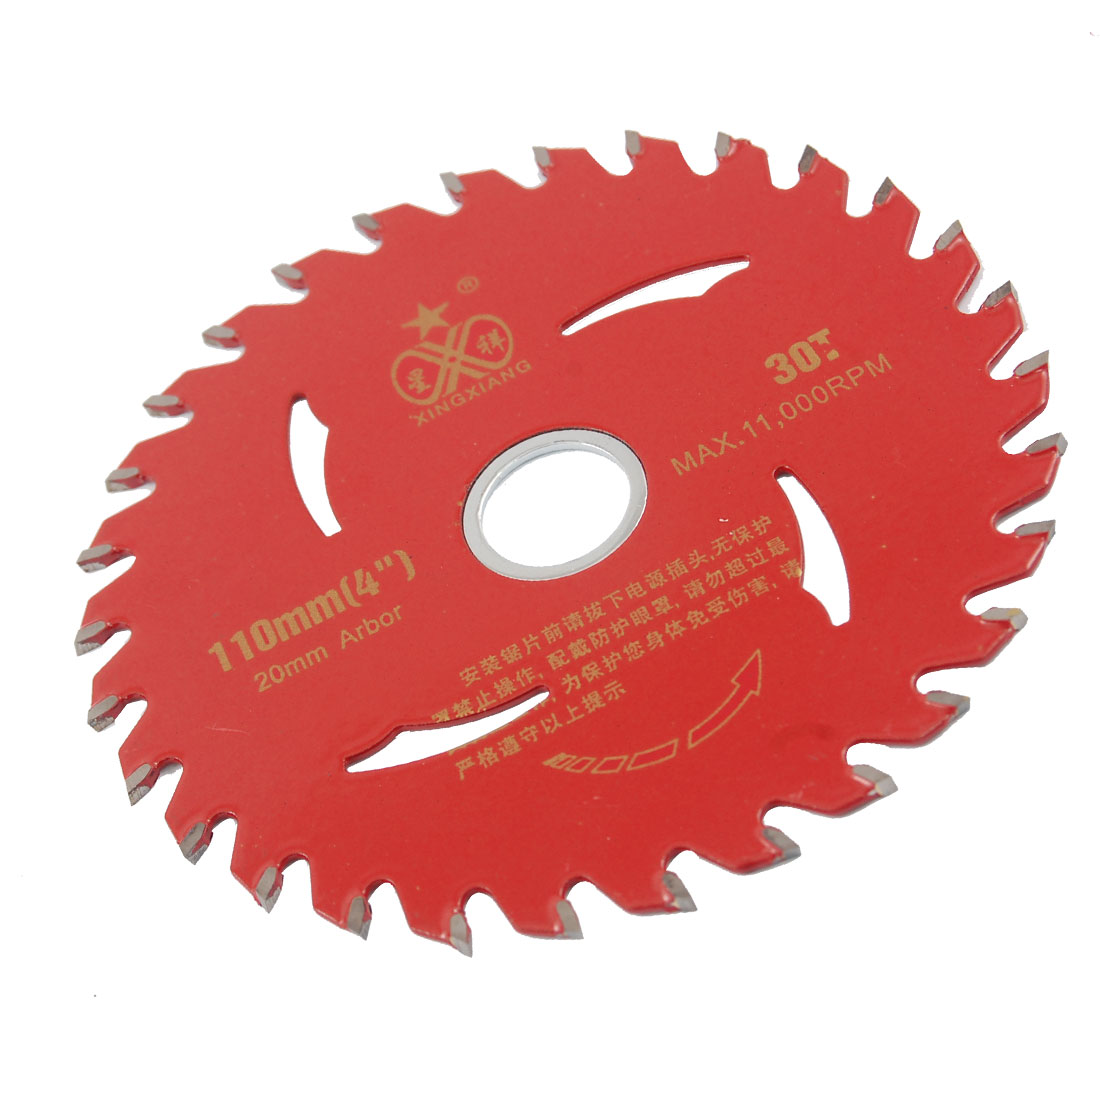 Red 110mm x 20mm 30 Teeth Circular Milling Cutter Slitting Saw